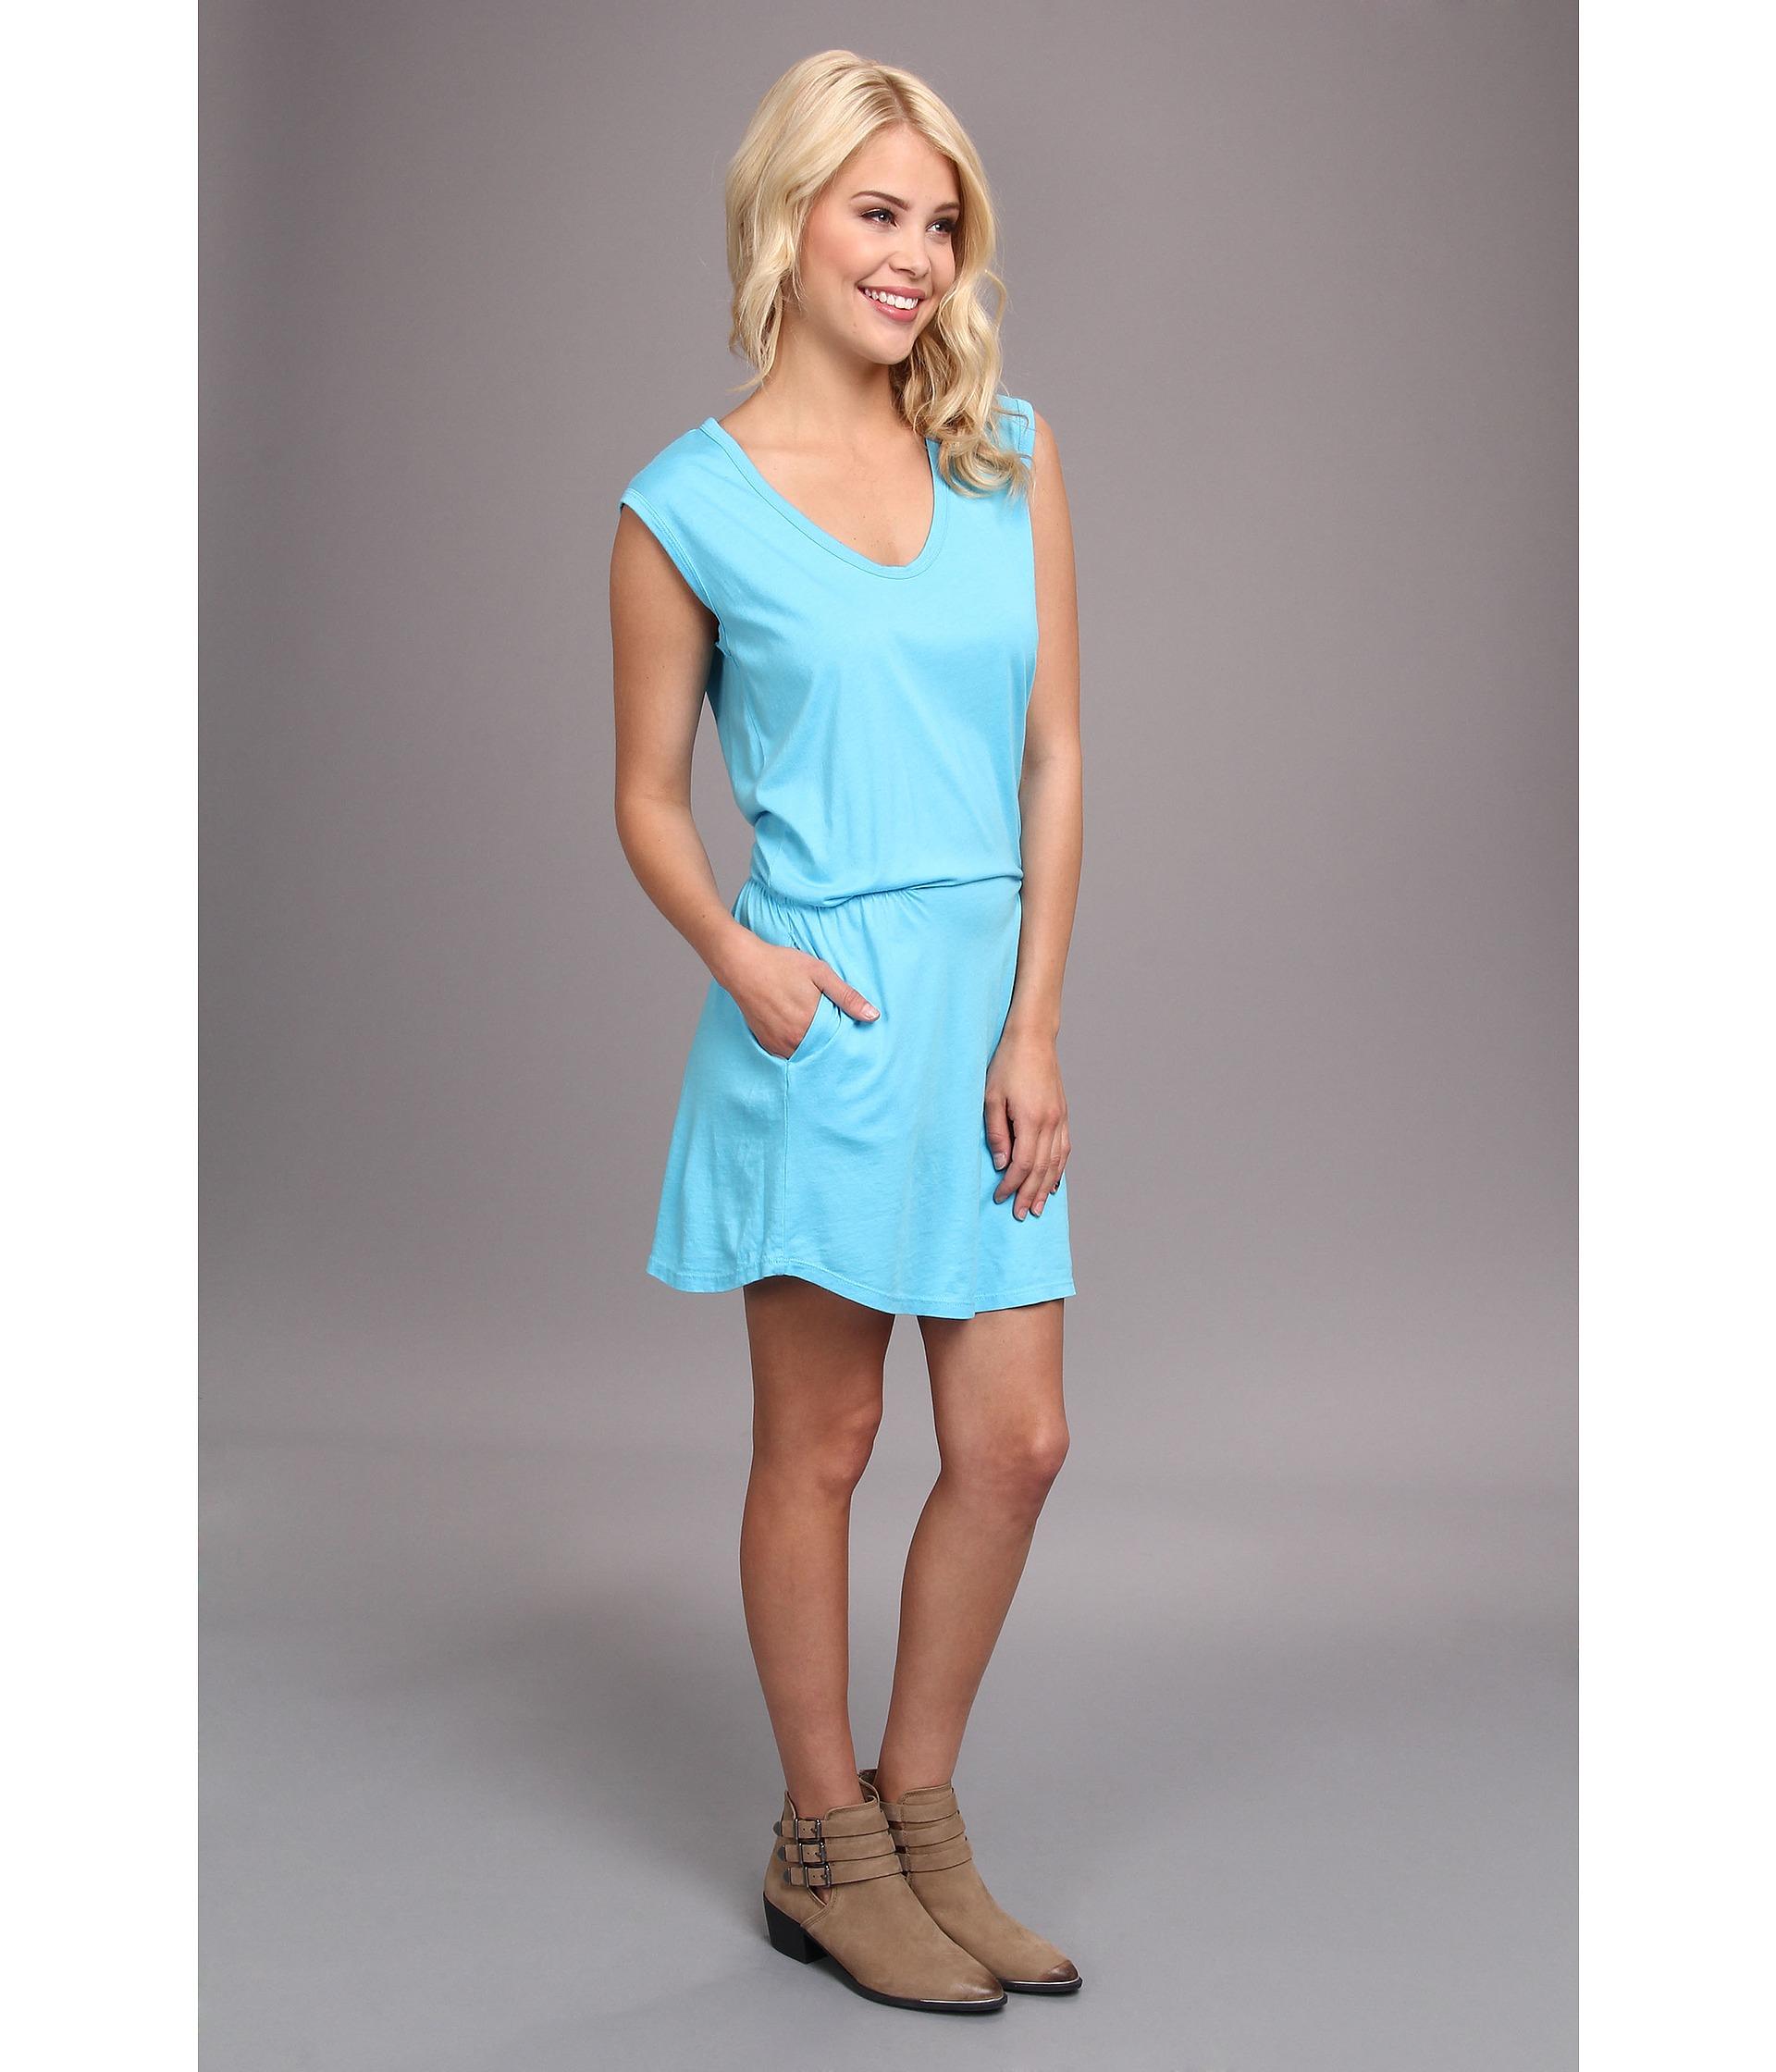 Alternative Apparel Dress August 2017